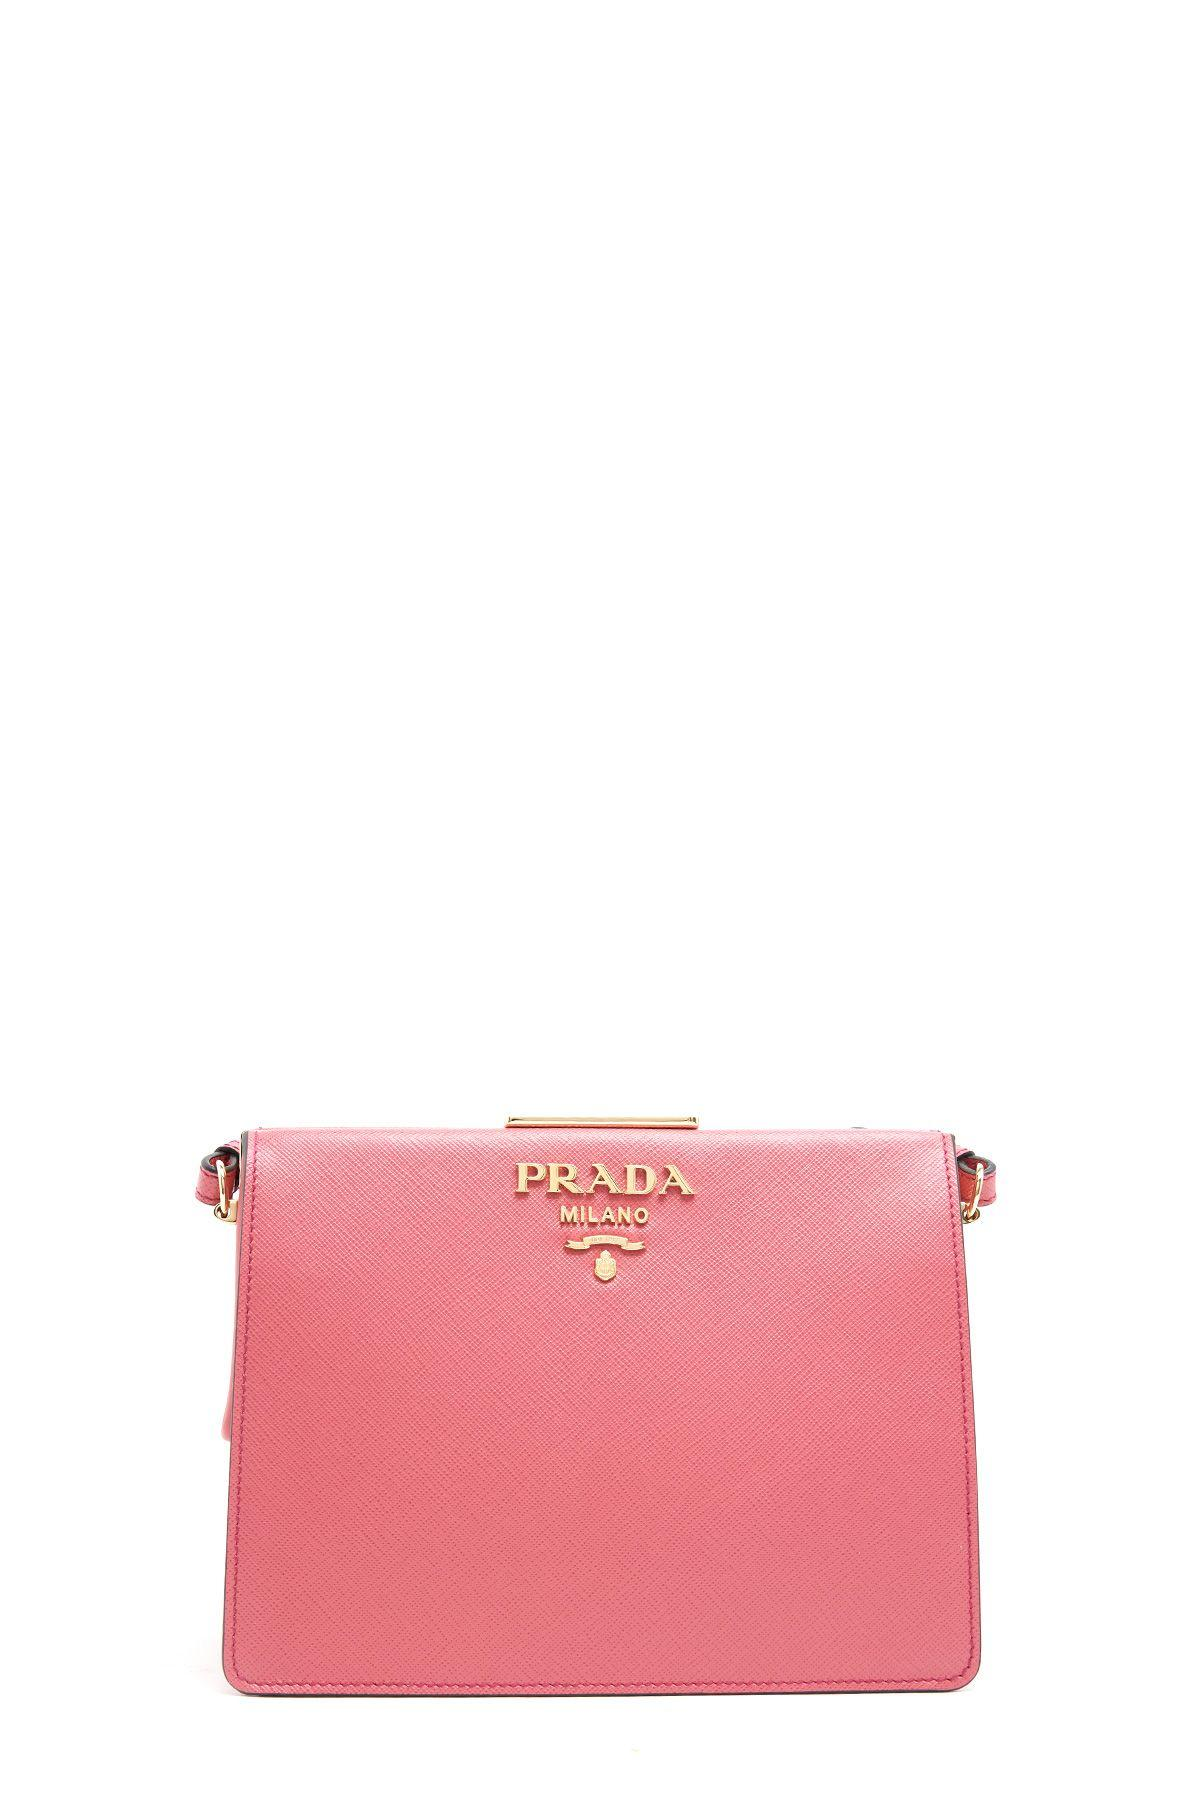 Prada Women's Leather Cross-body Messenger Shoulder Bag In Pink